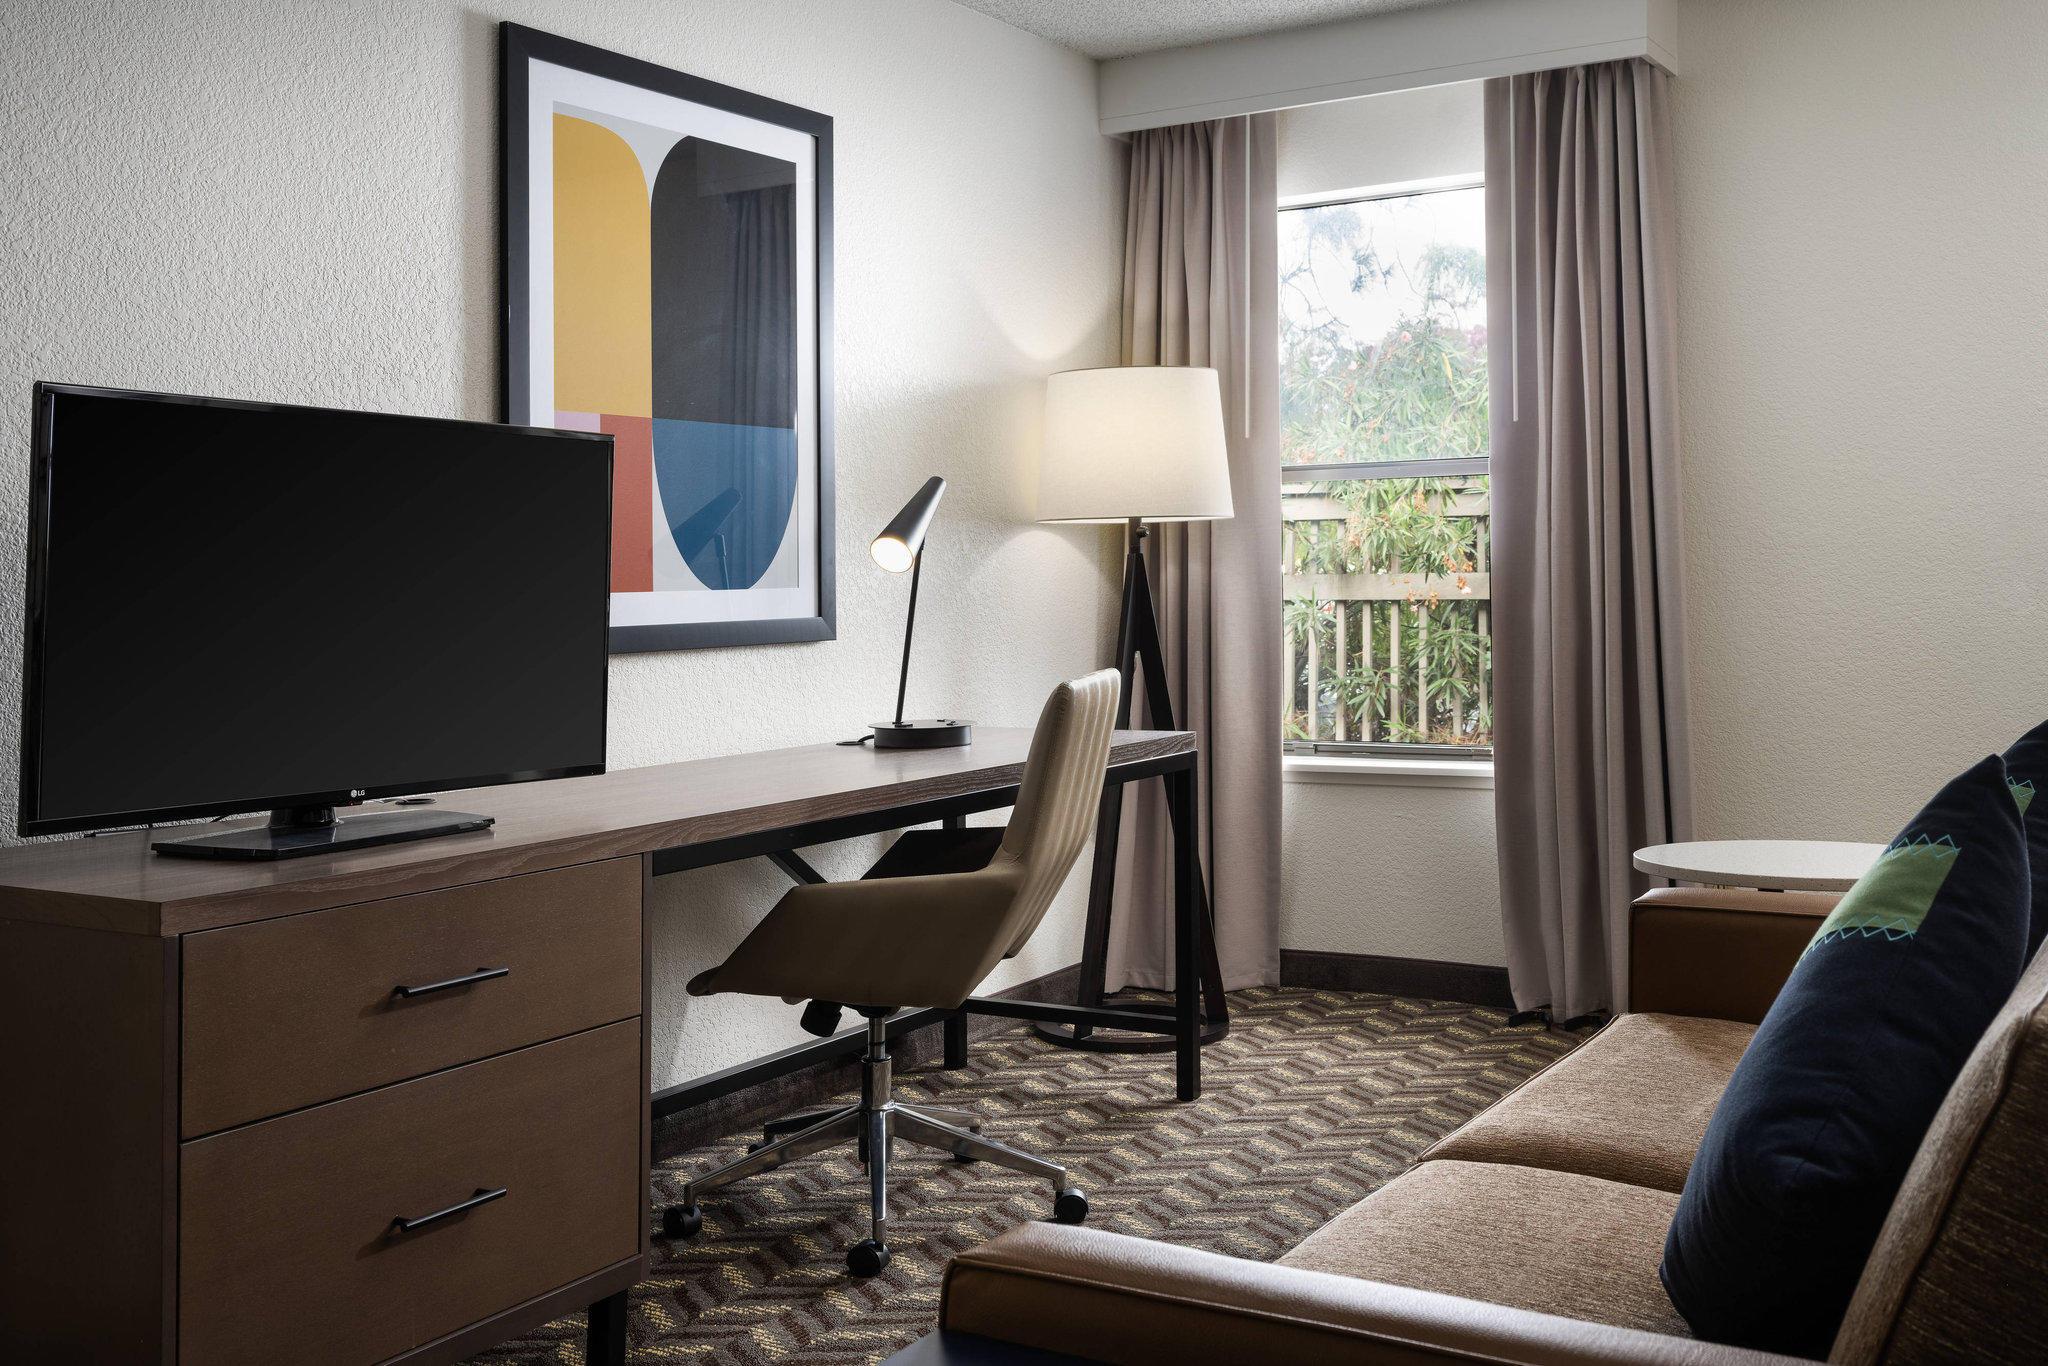 Residence Inn by Marriott Sunnyvale Silicon Valley II